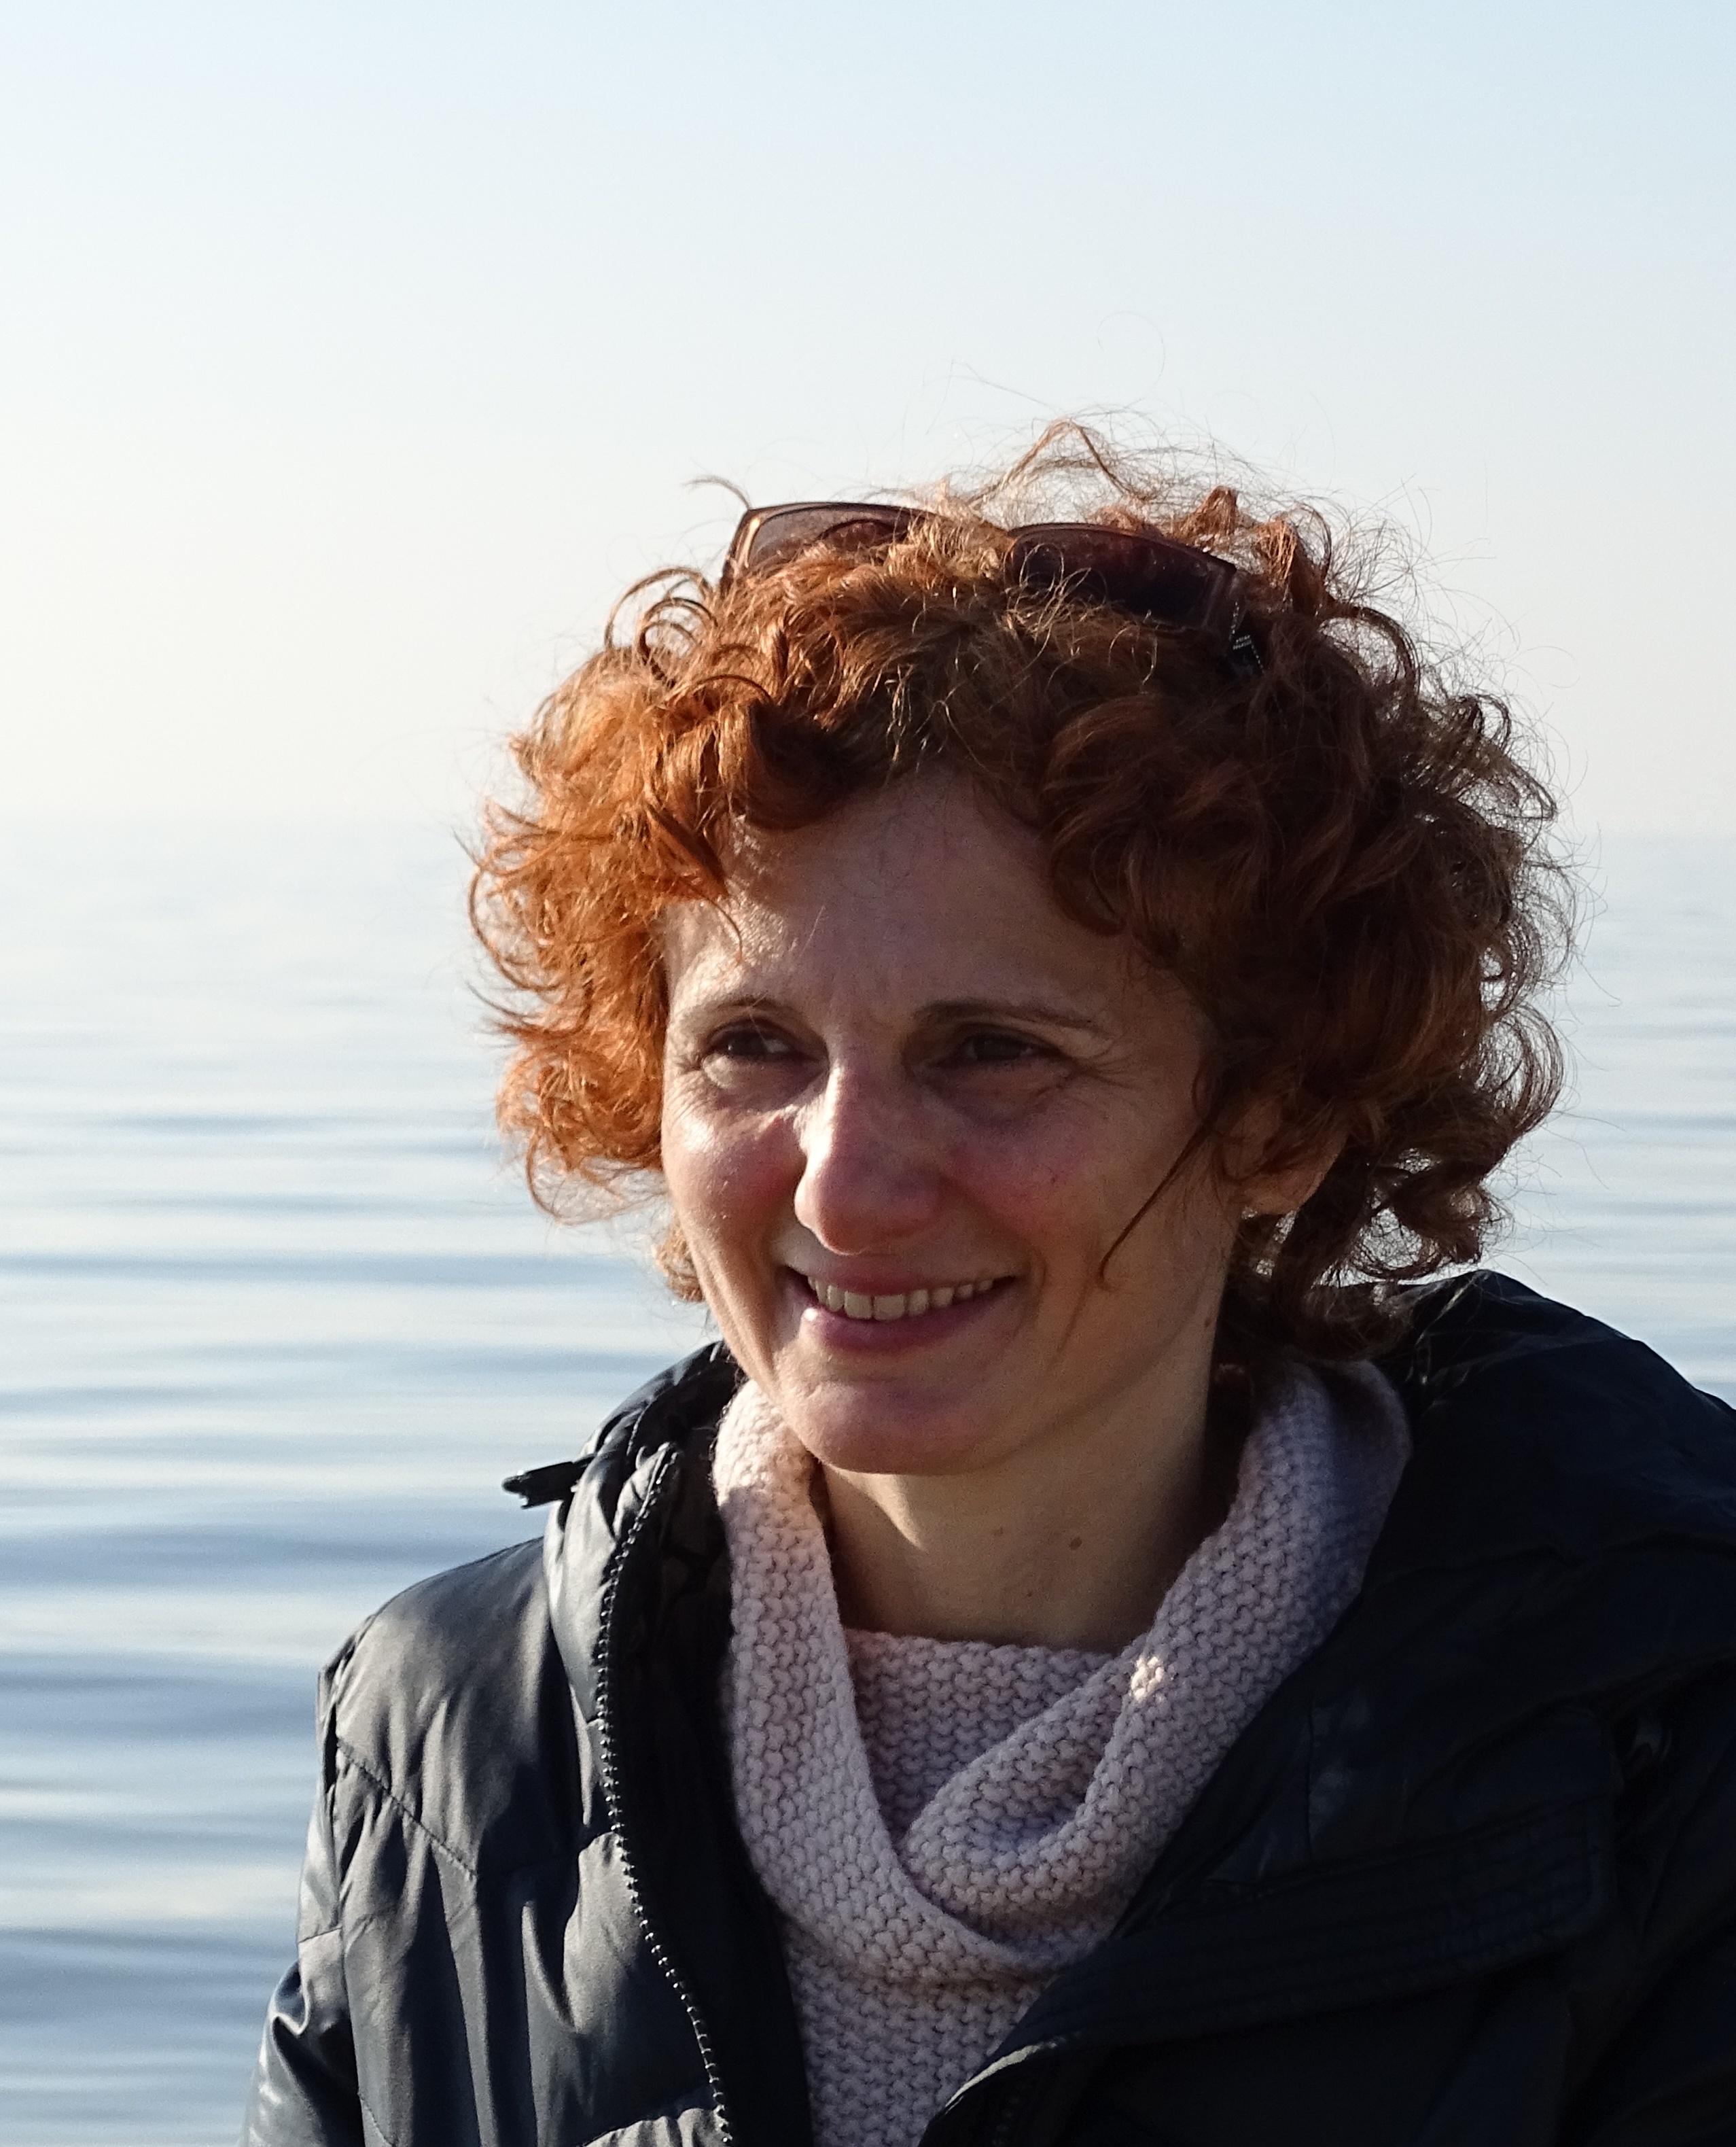 nadia + '-' + meli-prospero-editore